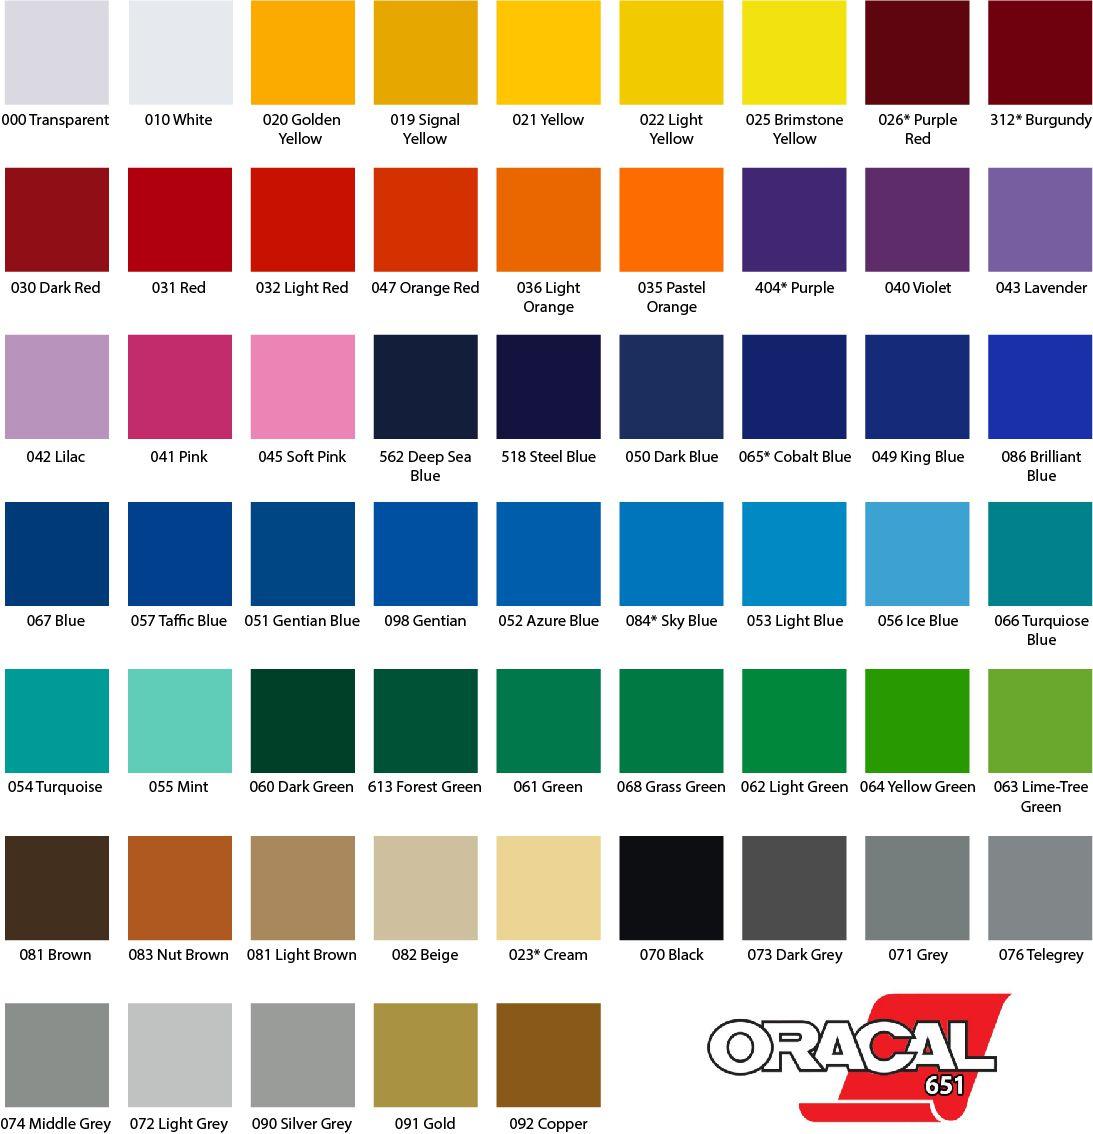 Adesivo Oracal 651 061 Green 1,26m x 1,00m